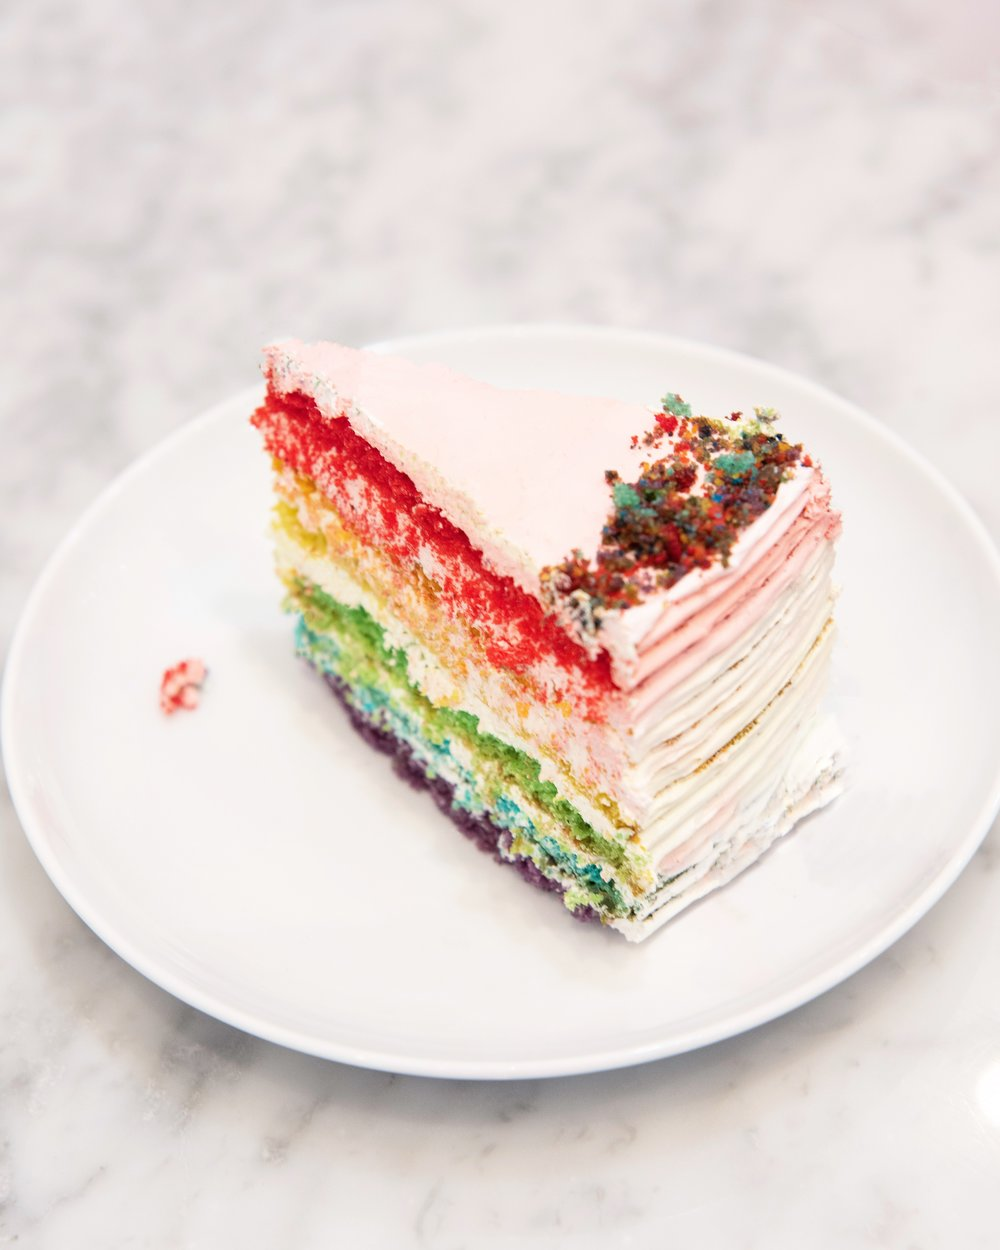 Rainbow Cake at Bing Bing Cafe Barcelona